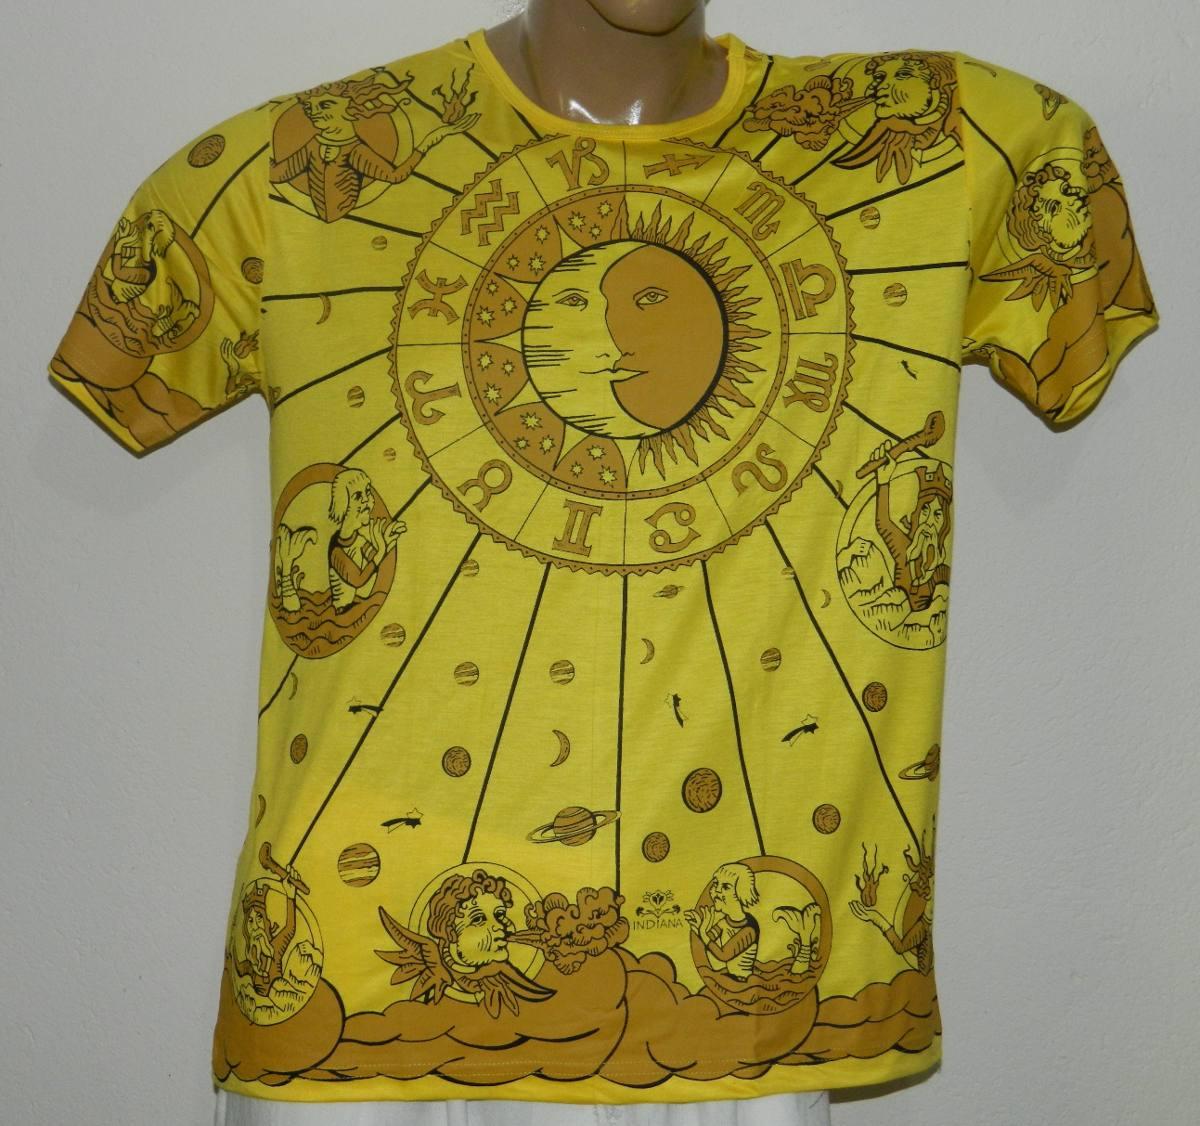 ce8a02765 camisa indiana zodiaco signos sol lua hippie tenda roots. Carregando zoom.